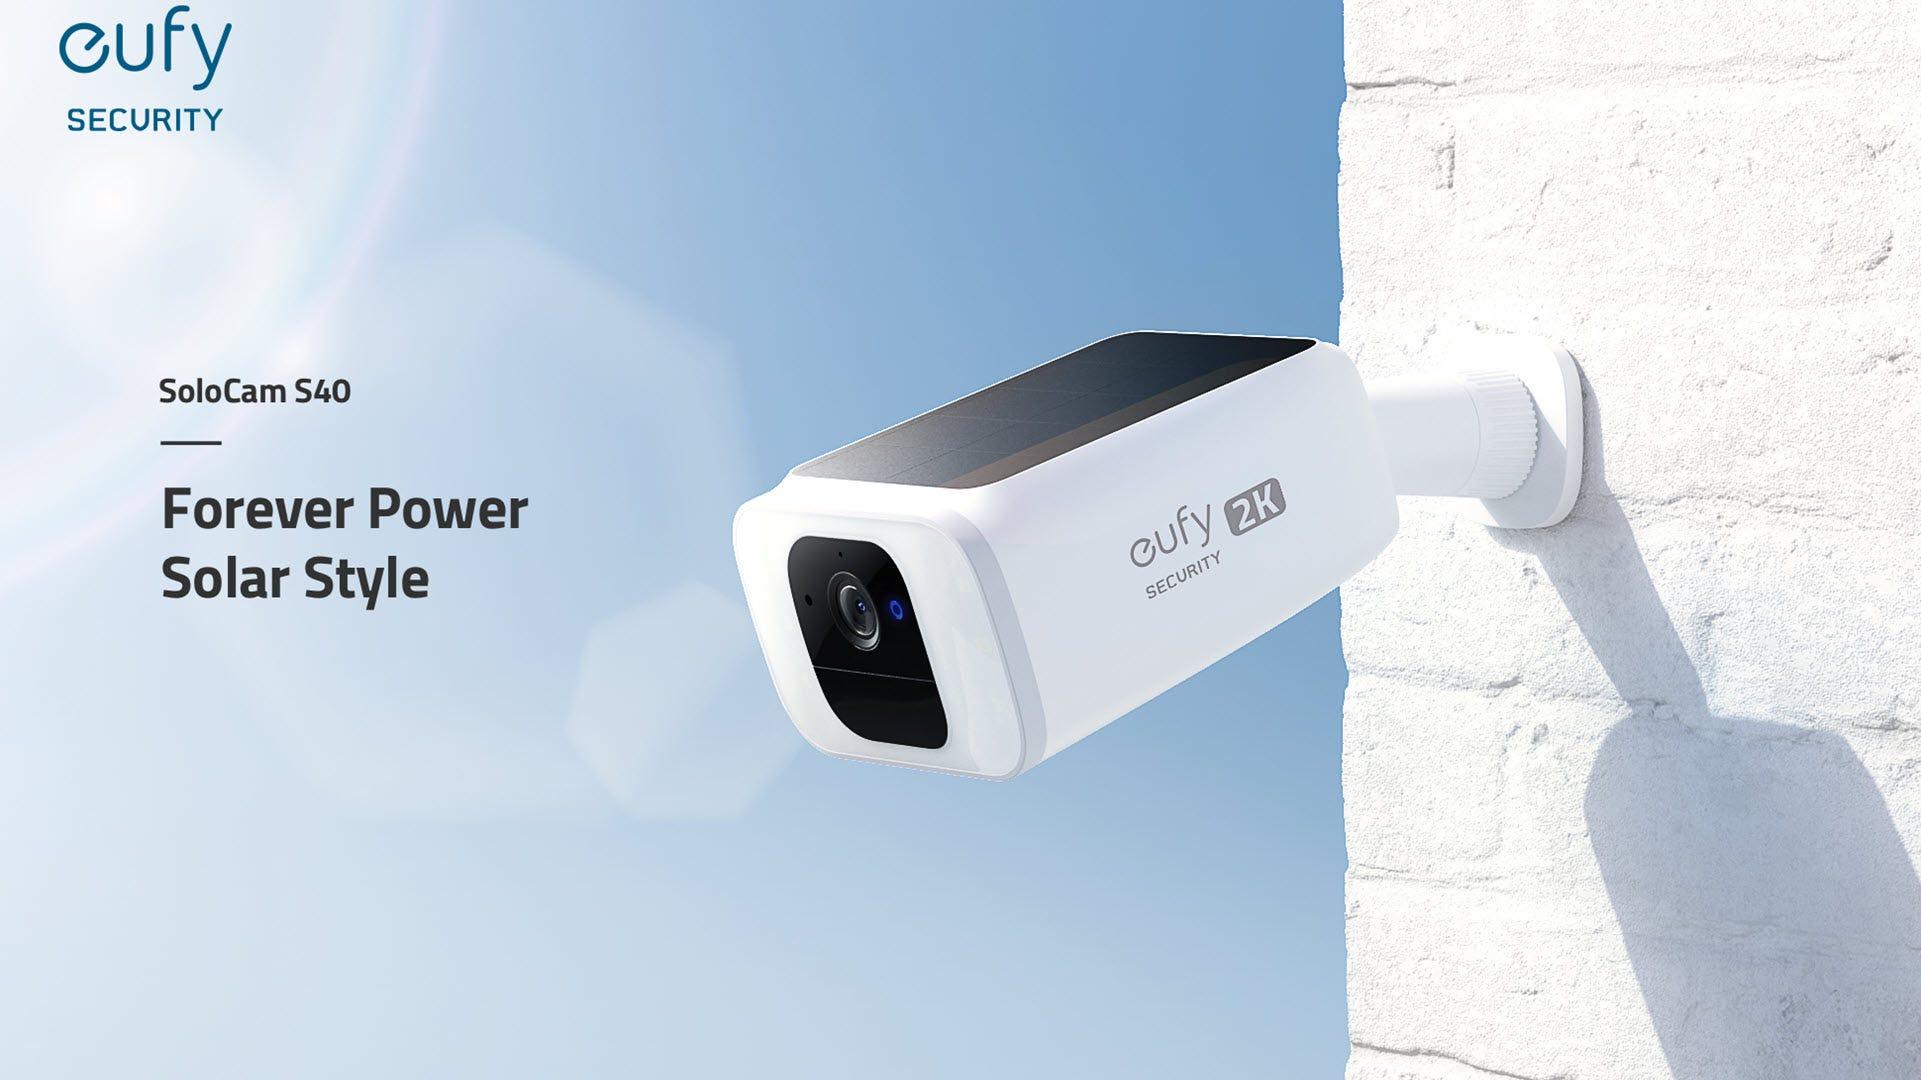 A solar powered camera under the sun.